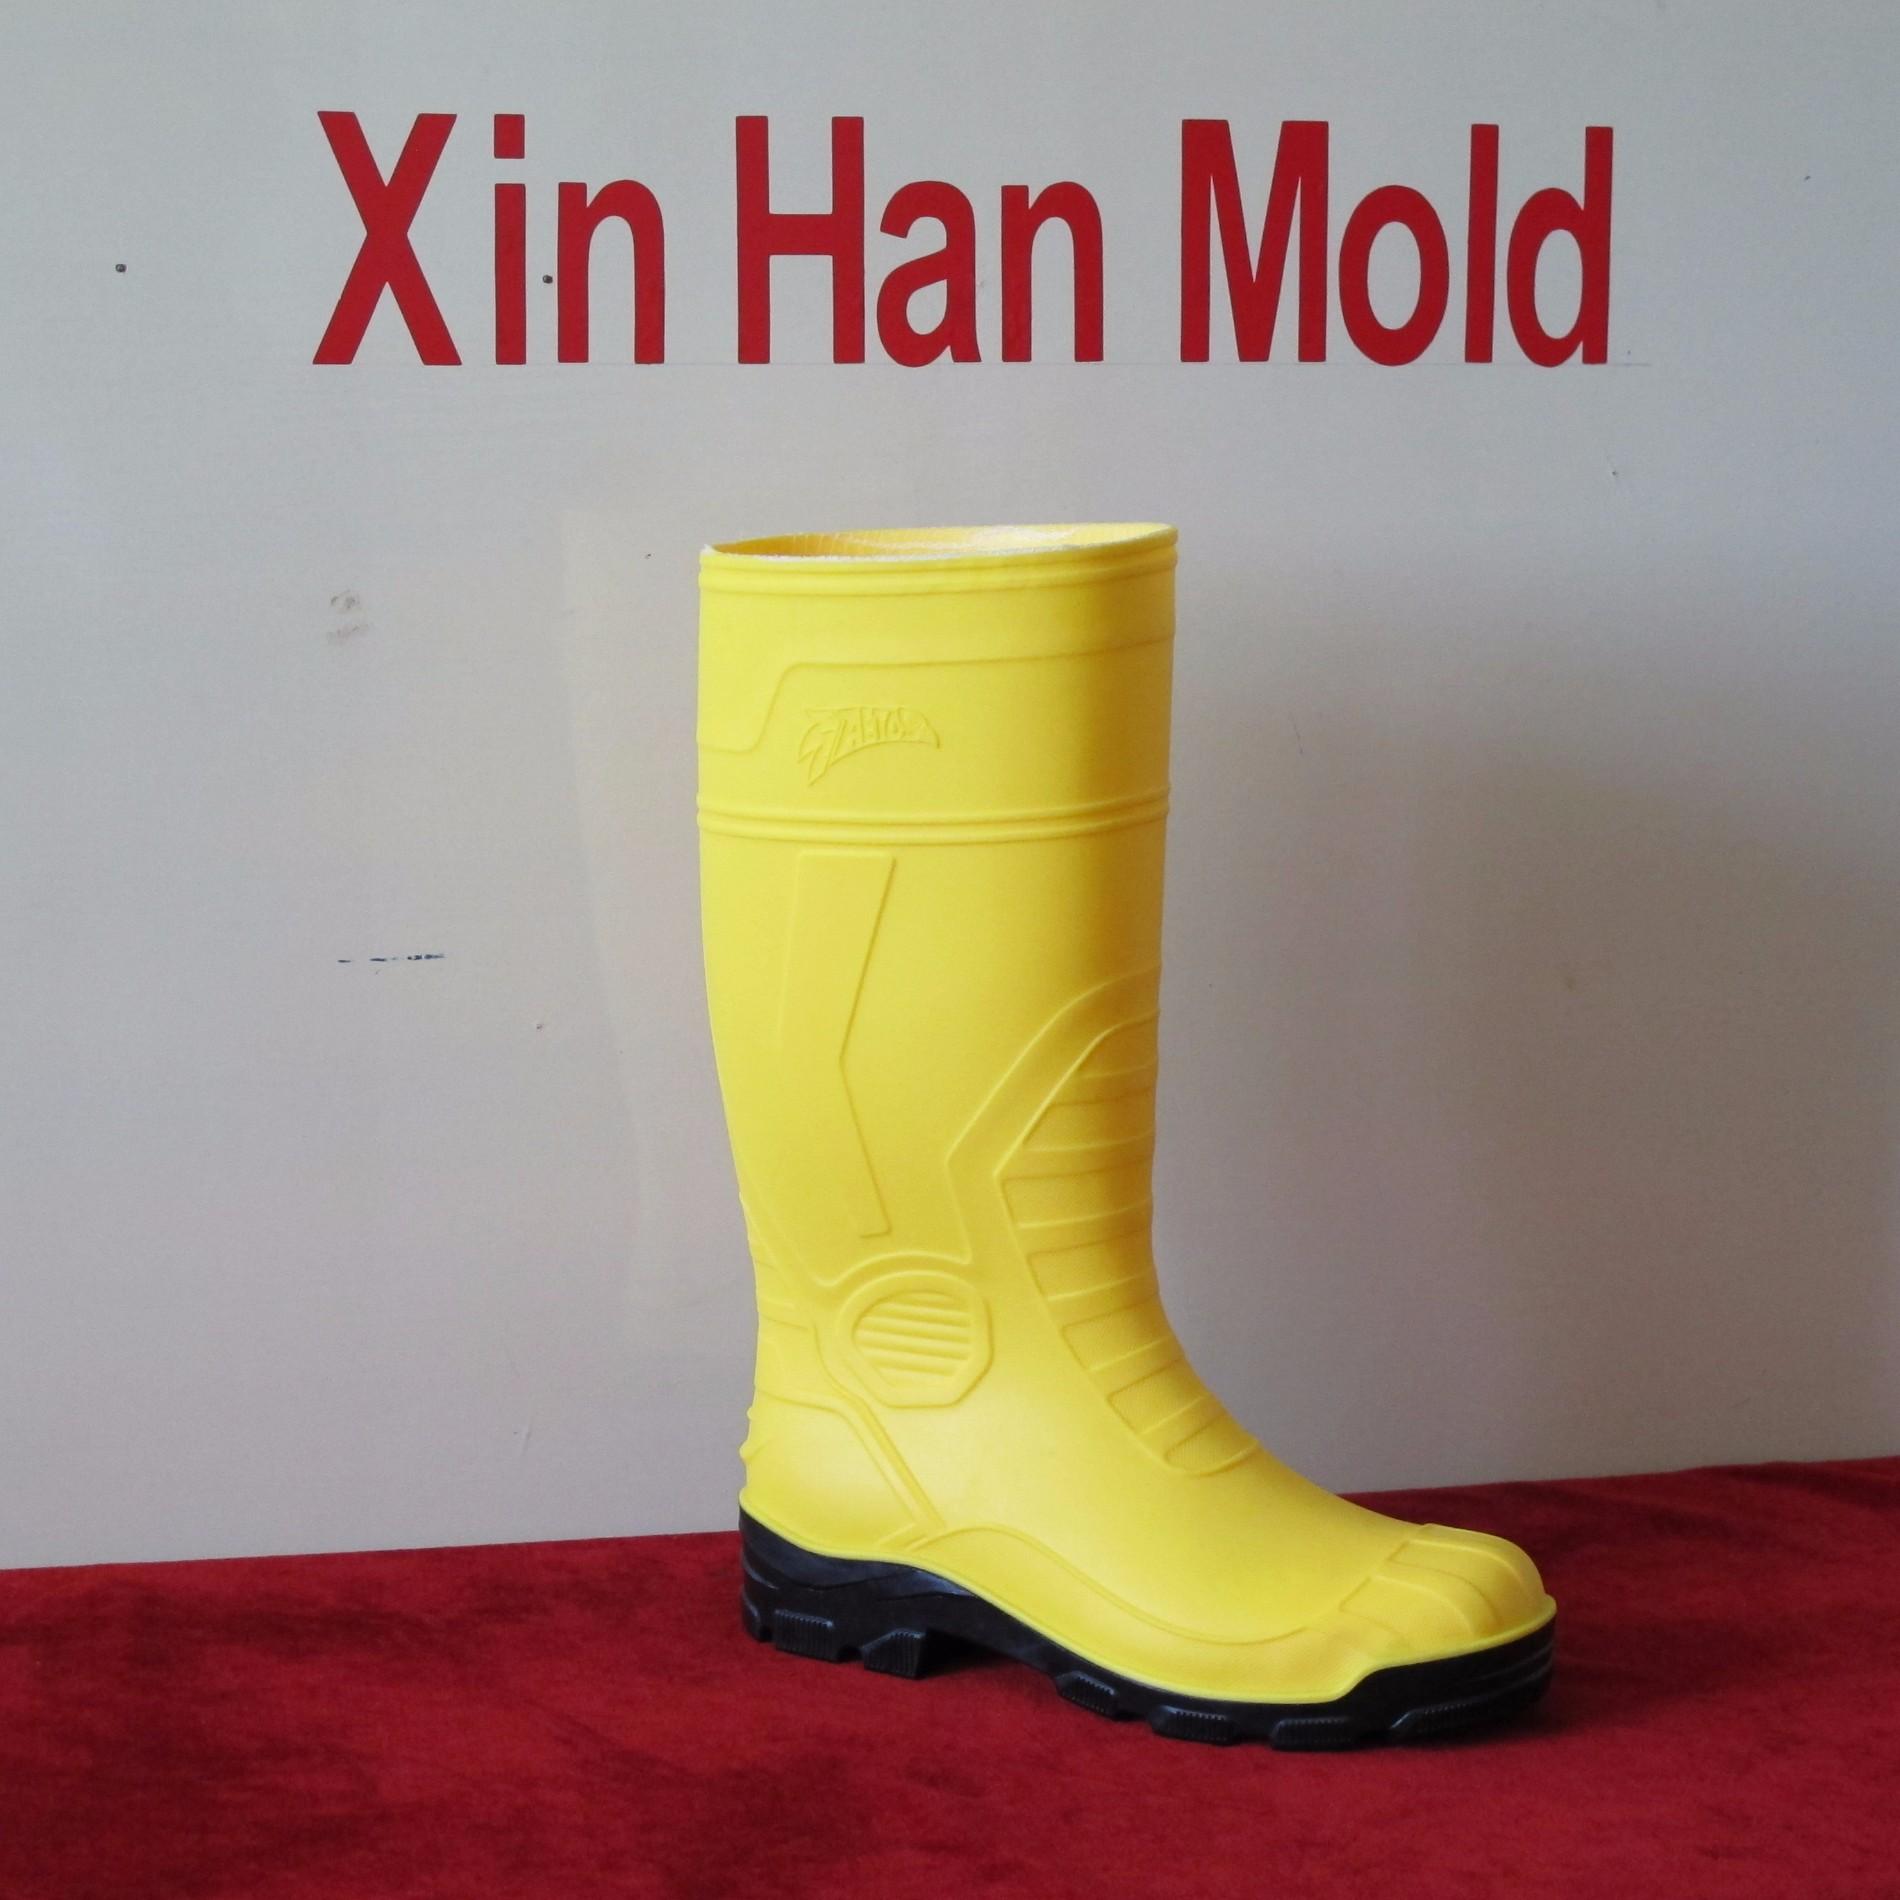 PVC Gumboot Mould Manufacturers, PVC Gumboot Mould Factory, Supply PVC Gumboot Mould